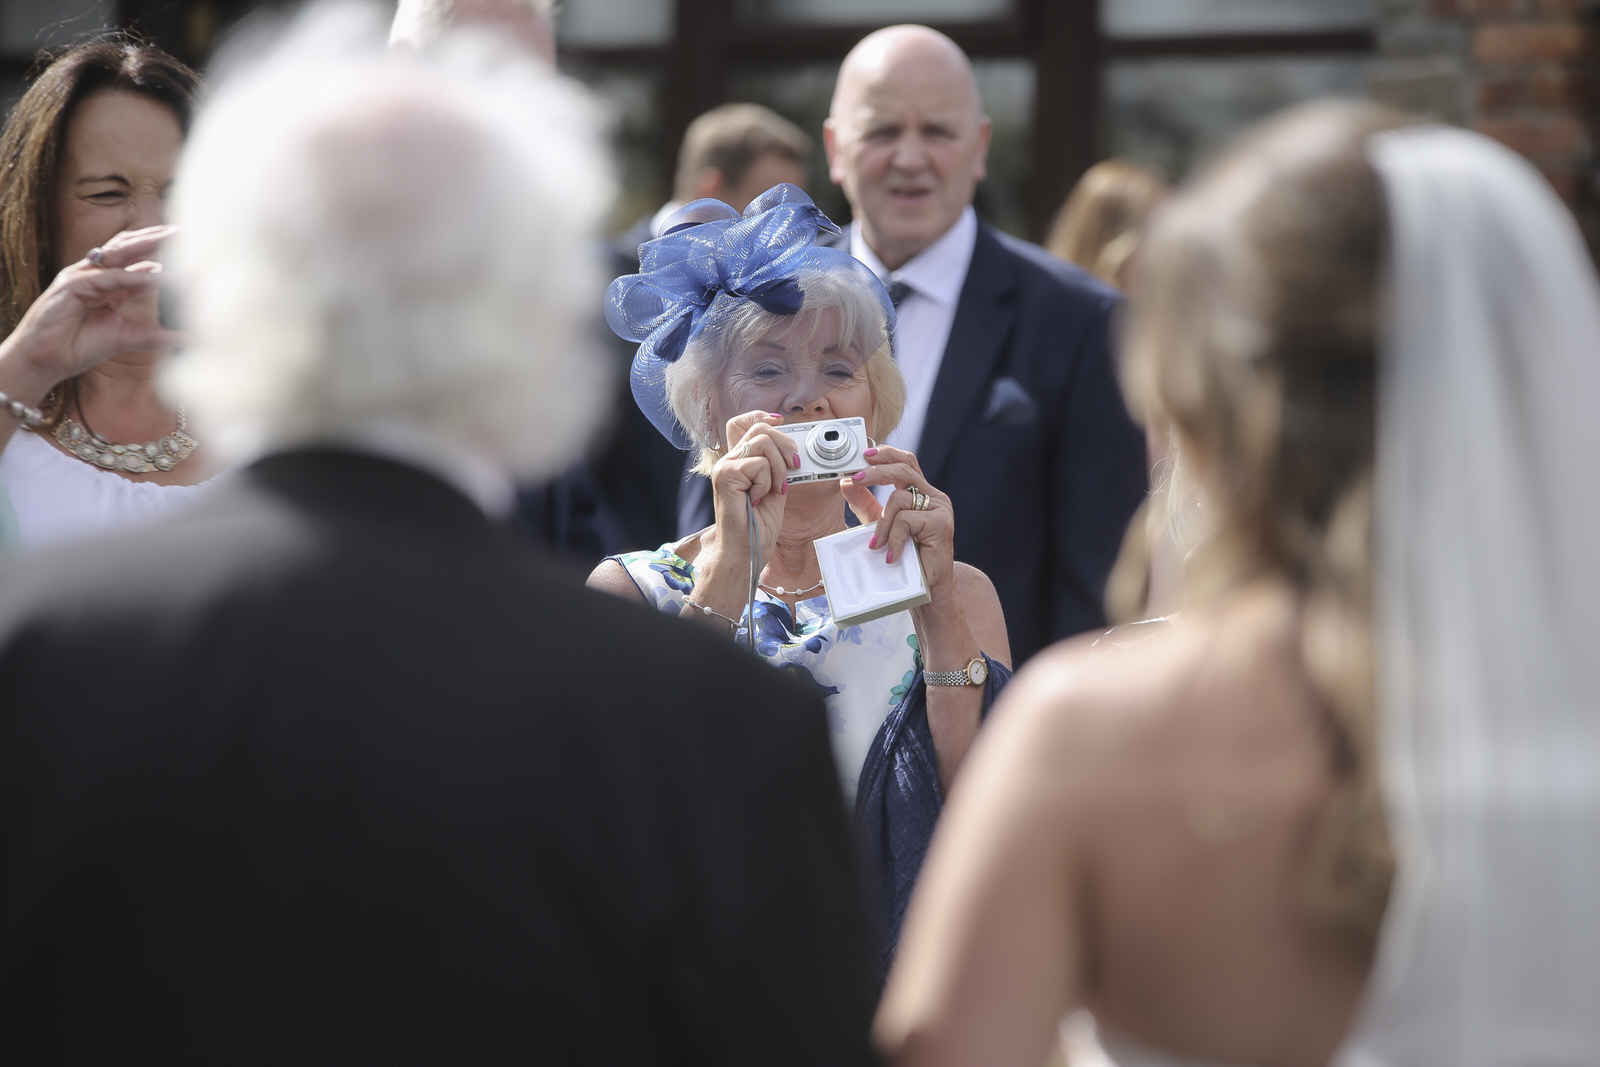 darver_castle_wedding_photographer_goldenmonentsweddingphotography_a243.jpg